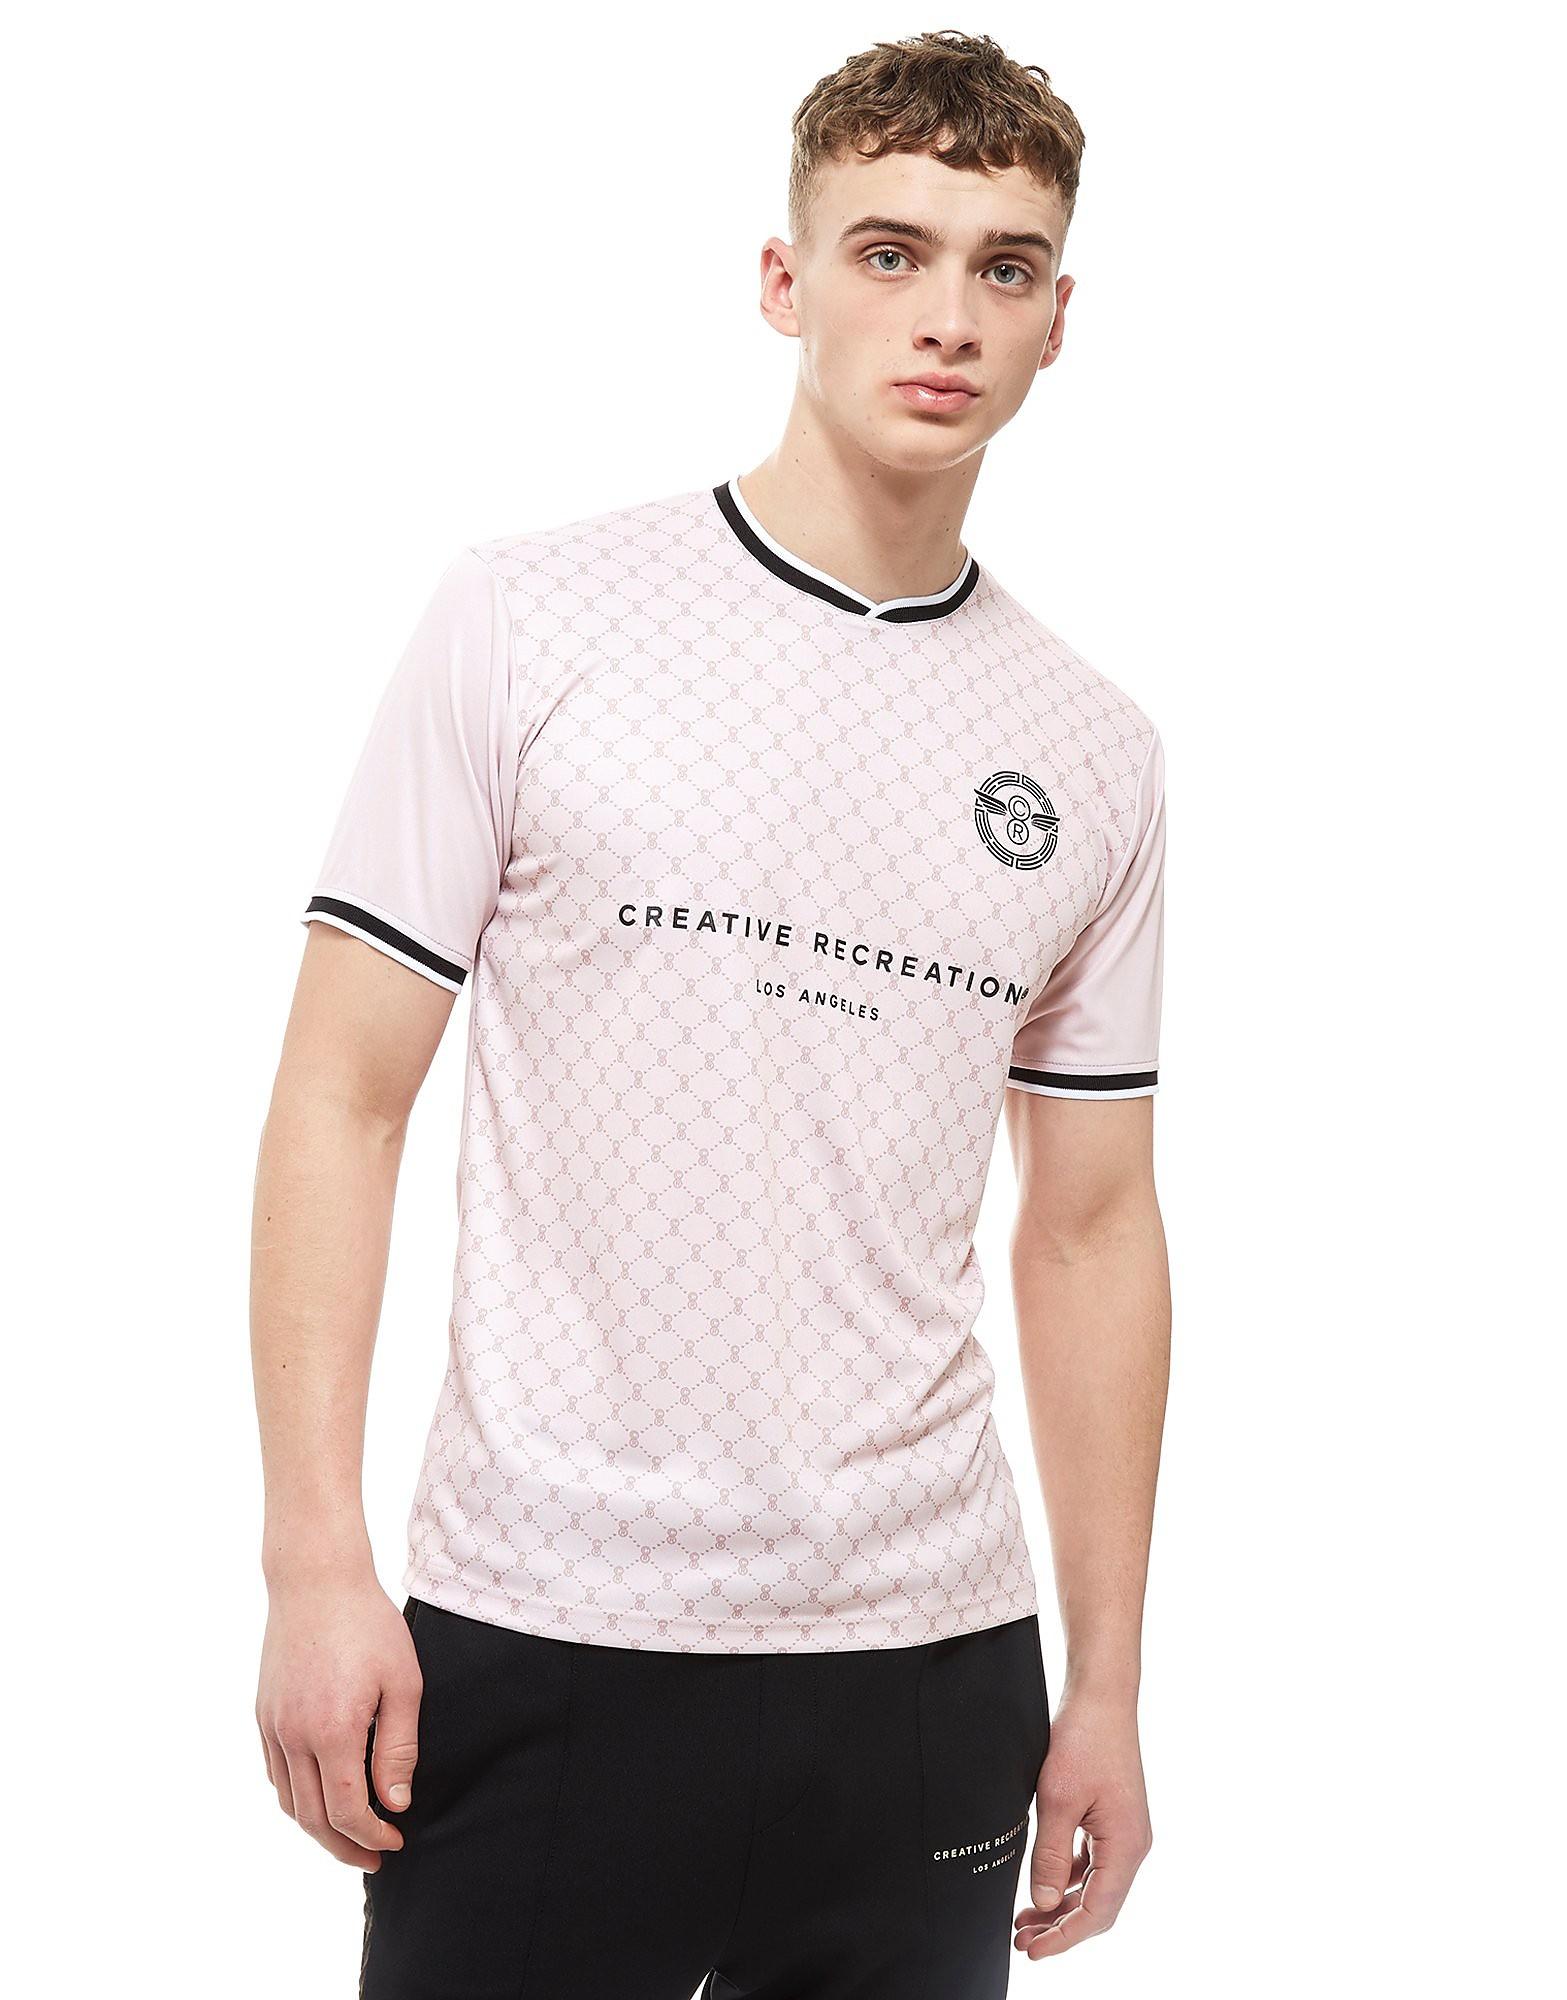 Creative Recreation House Pattern Soccer Shirt